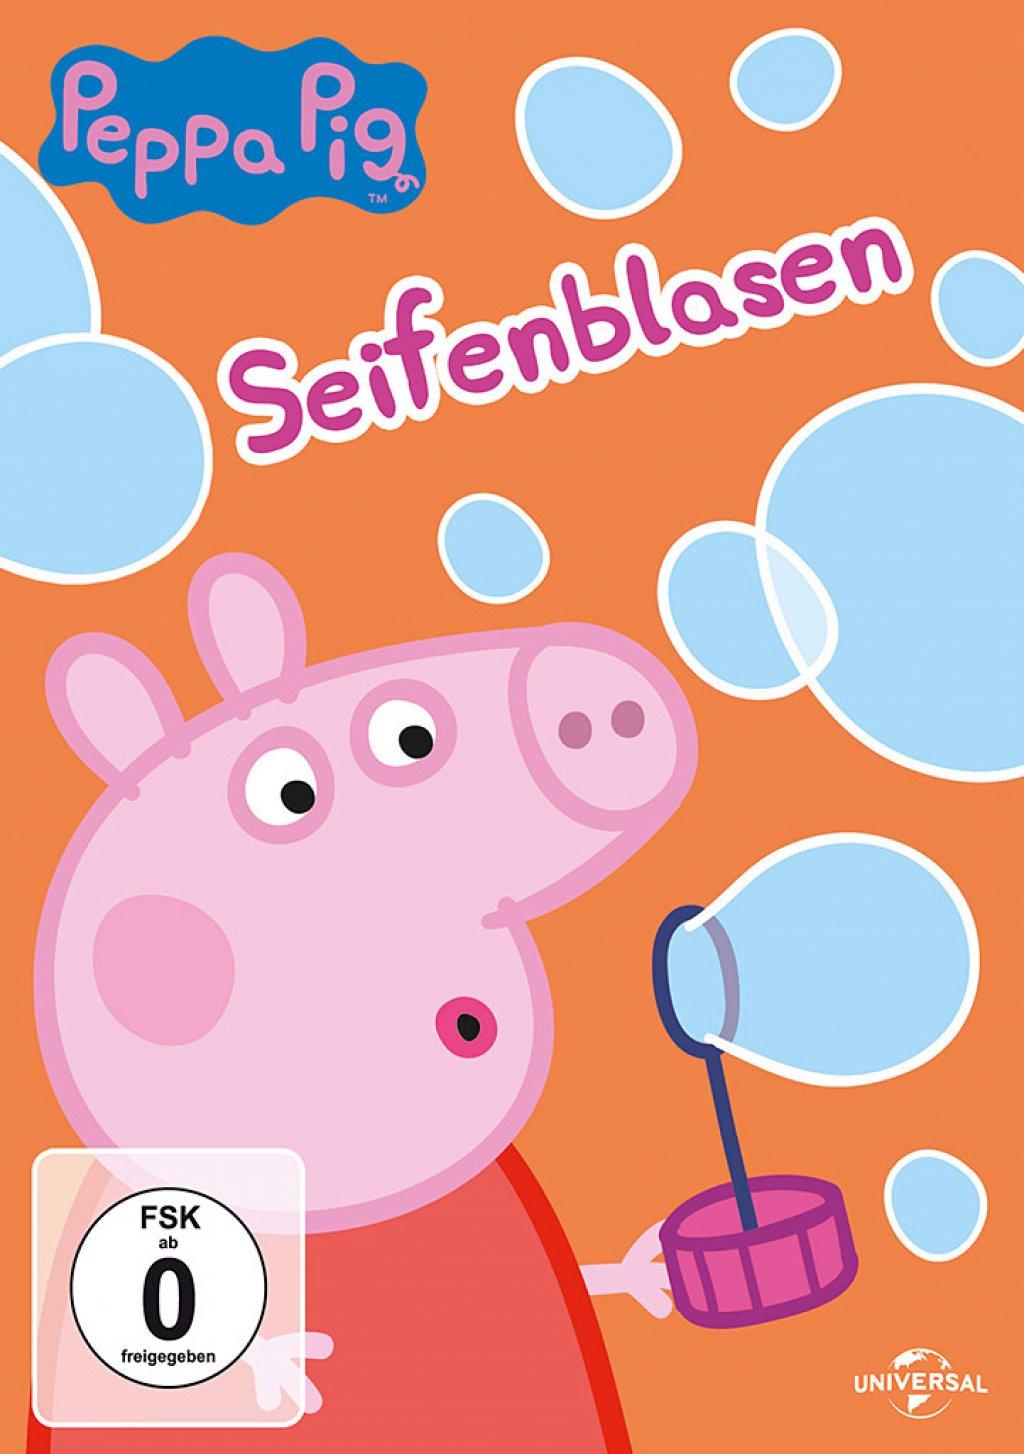 Peppa Pig - Vol. 6 / Seifenblasen (DVD)